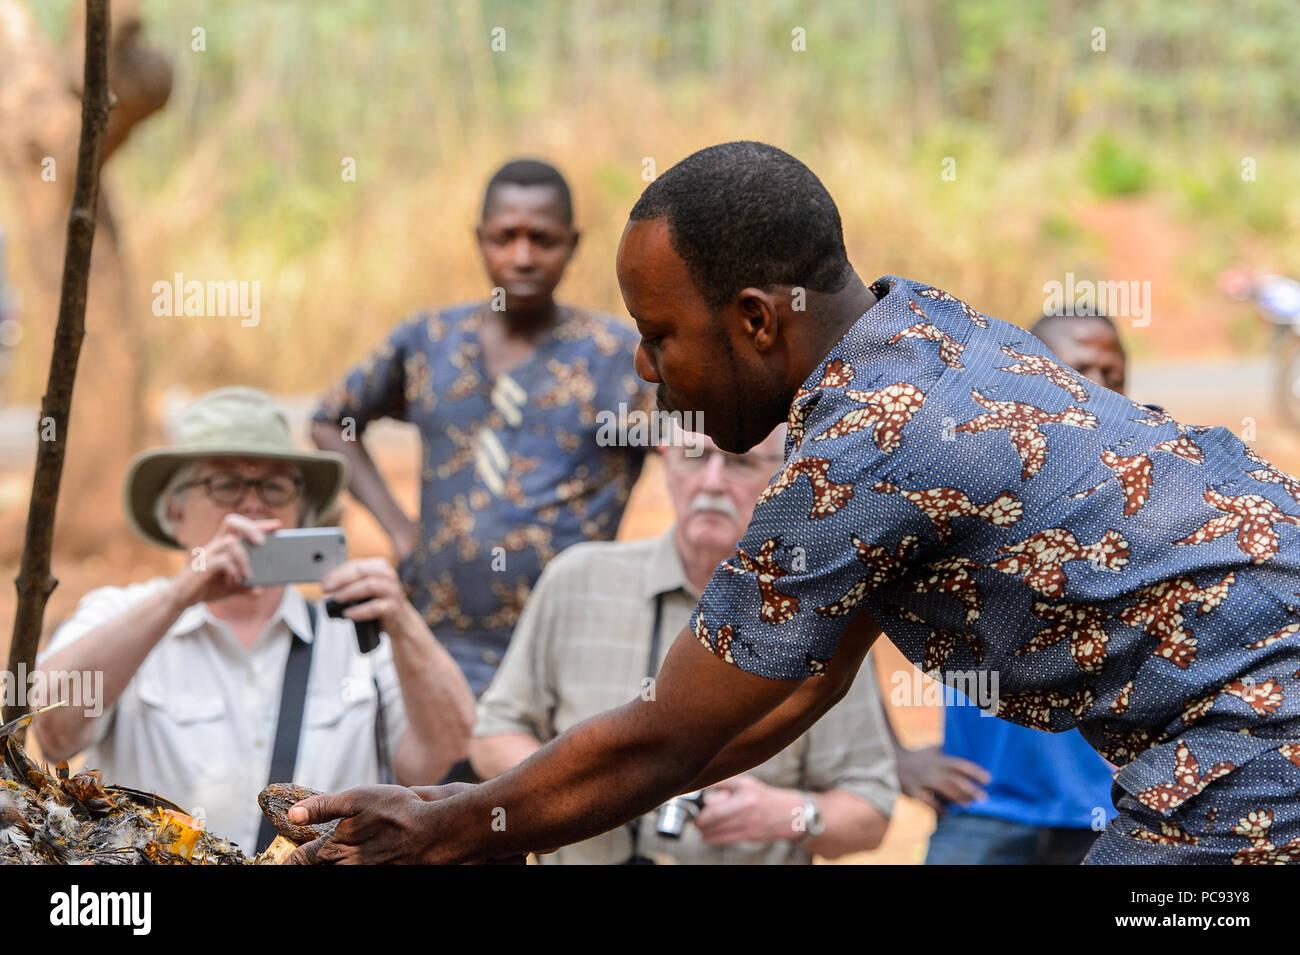 DANKOLI, BENIN - JAN 12, 2017: Unidentified Beninese man does some rituals as part of the voodoo cult. - Stock Image